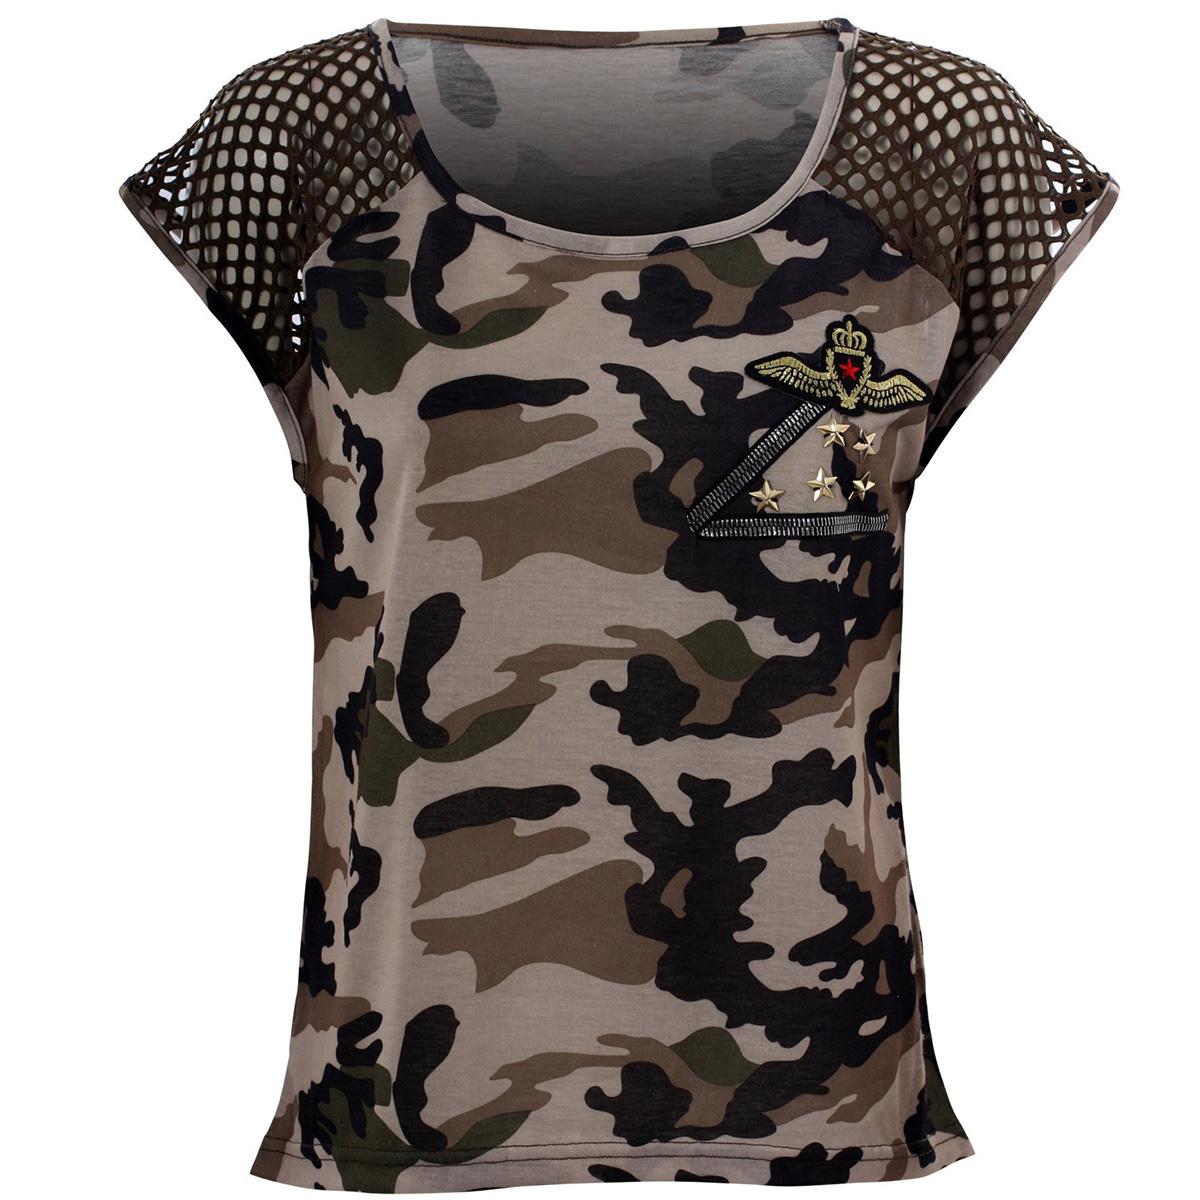 eve damen shirt mit netz camouflage t shirt top oberteil nks3169 ebay. Black Bedroom Furniture Sets. Home Design Ideas